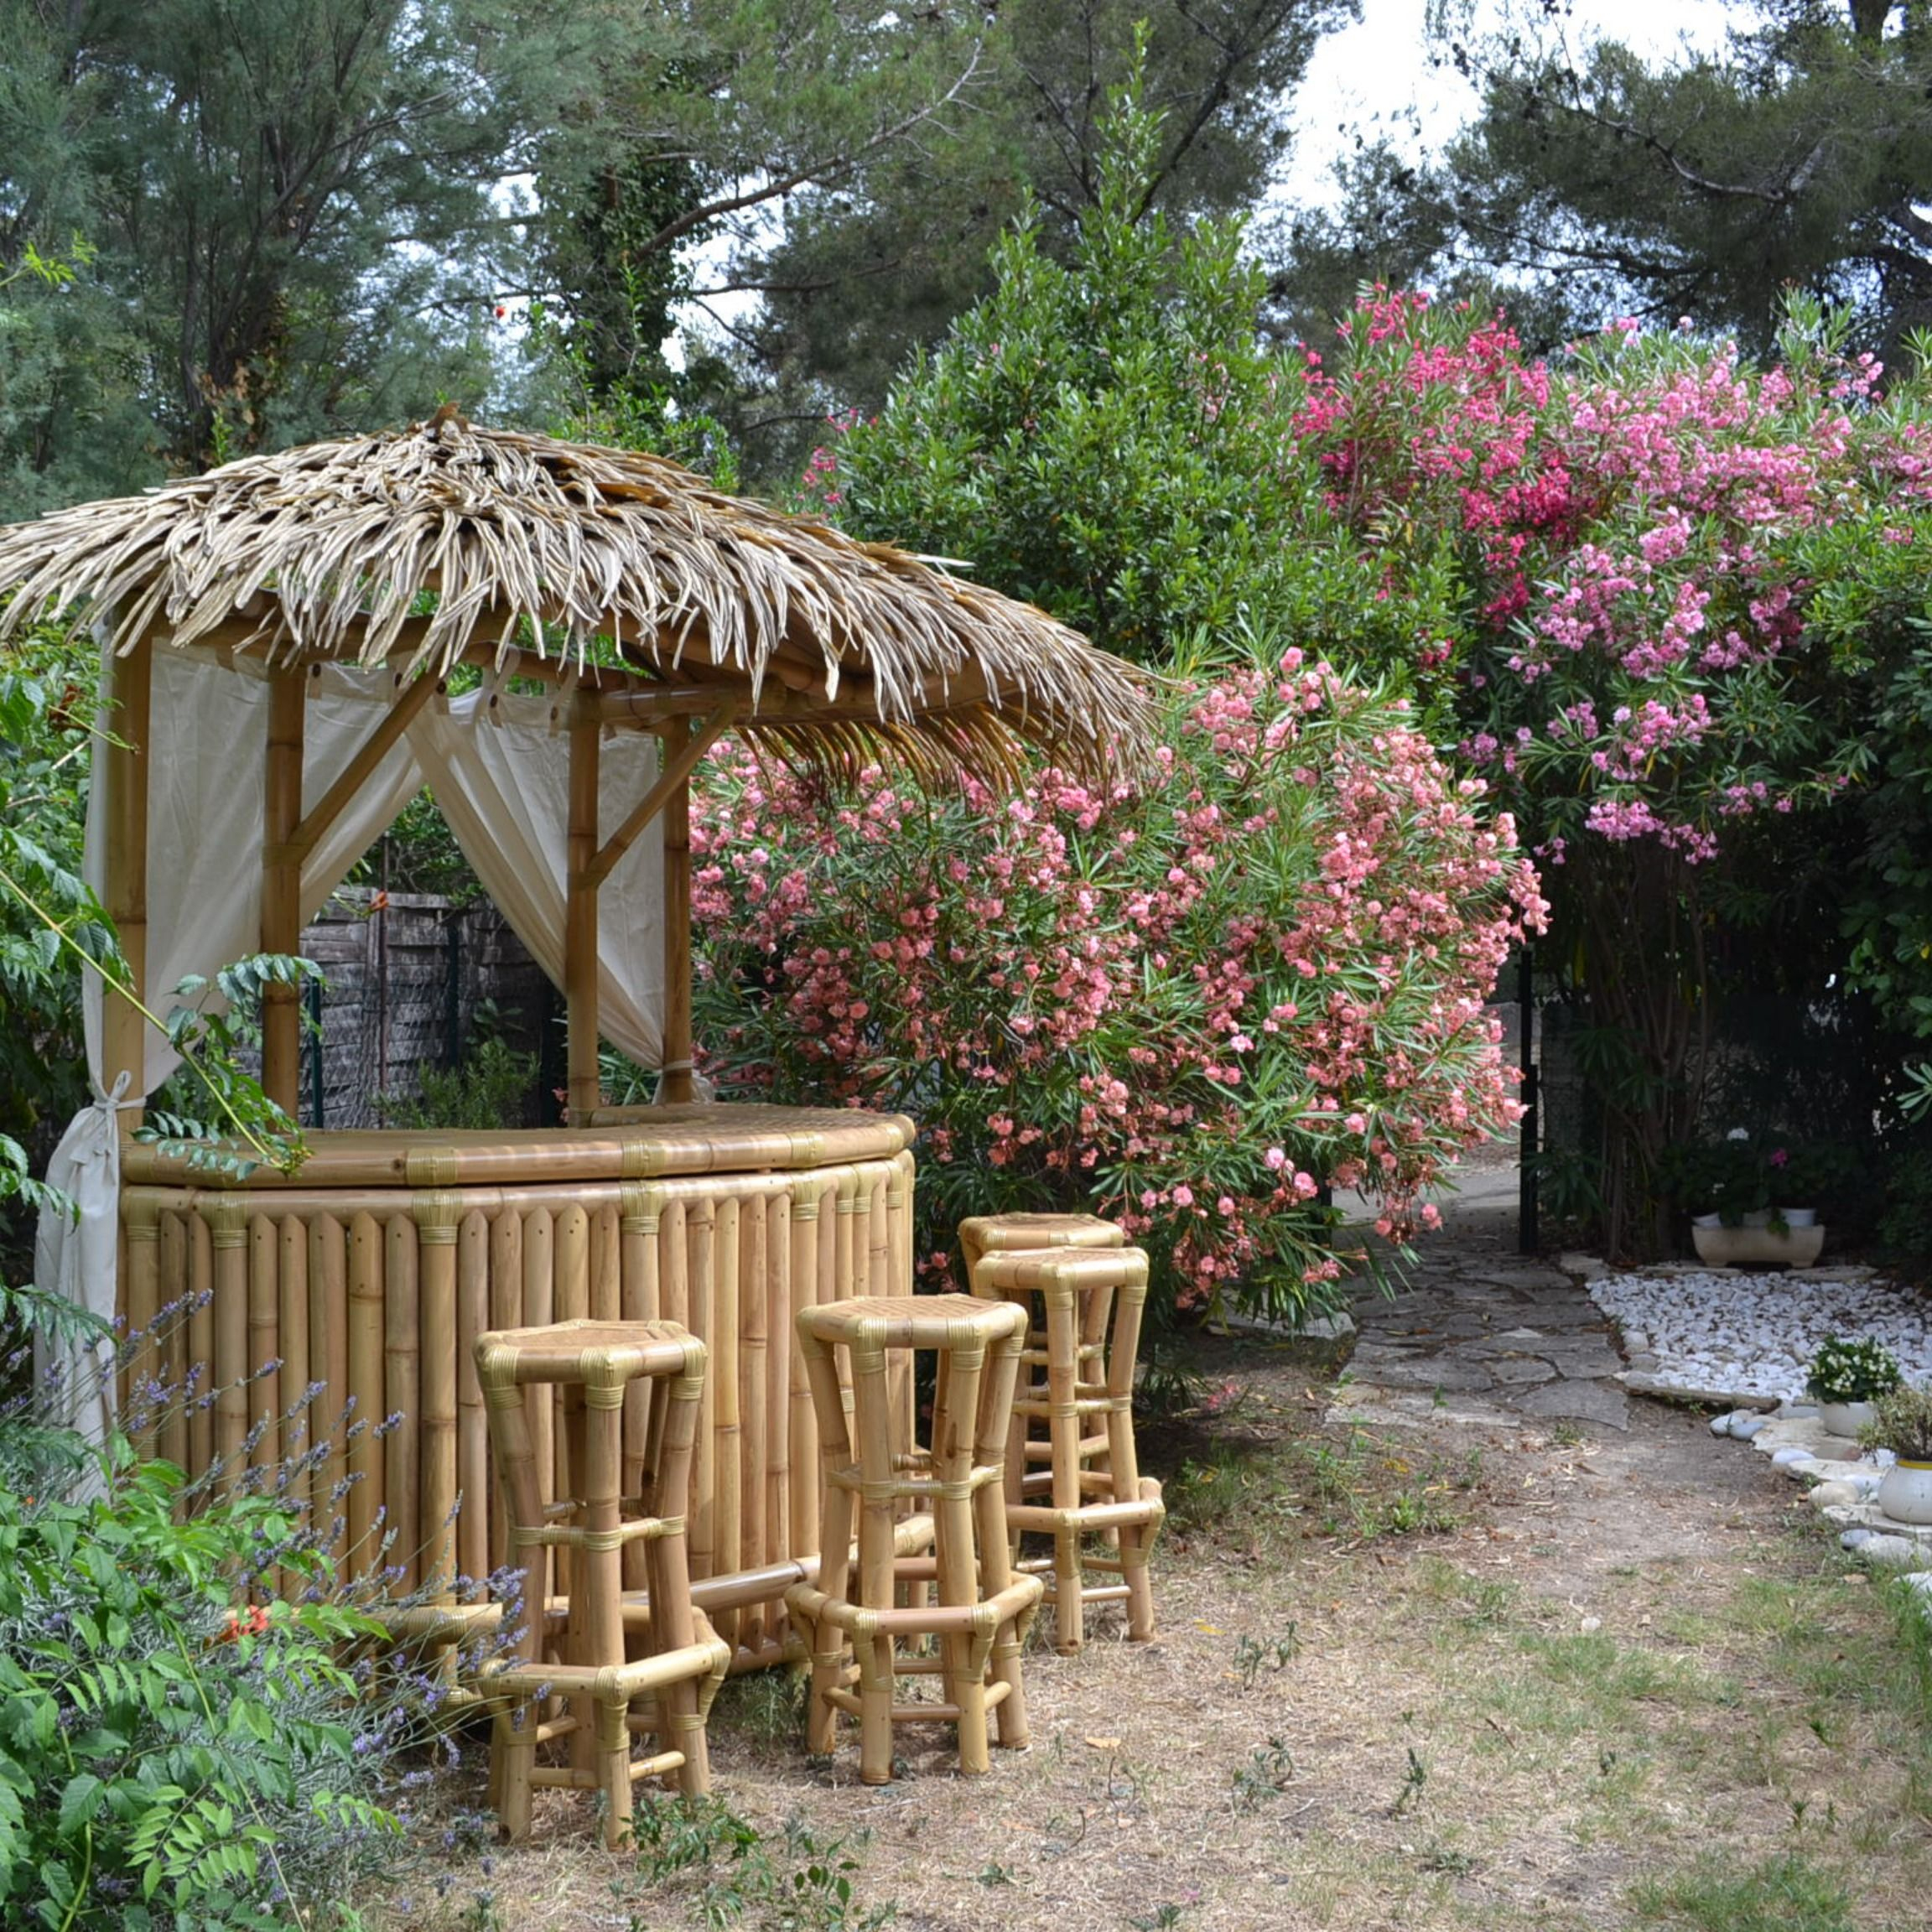 Épinglé Sur Gazebo Bambou, Paillote Bambou Et Bar En Bambou à Paillote Jardin